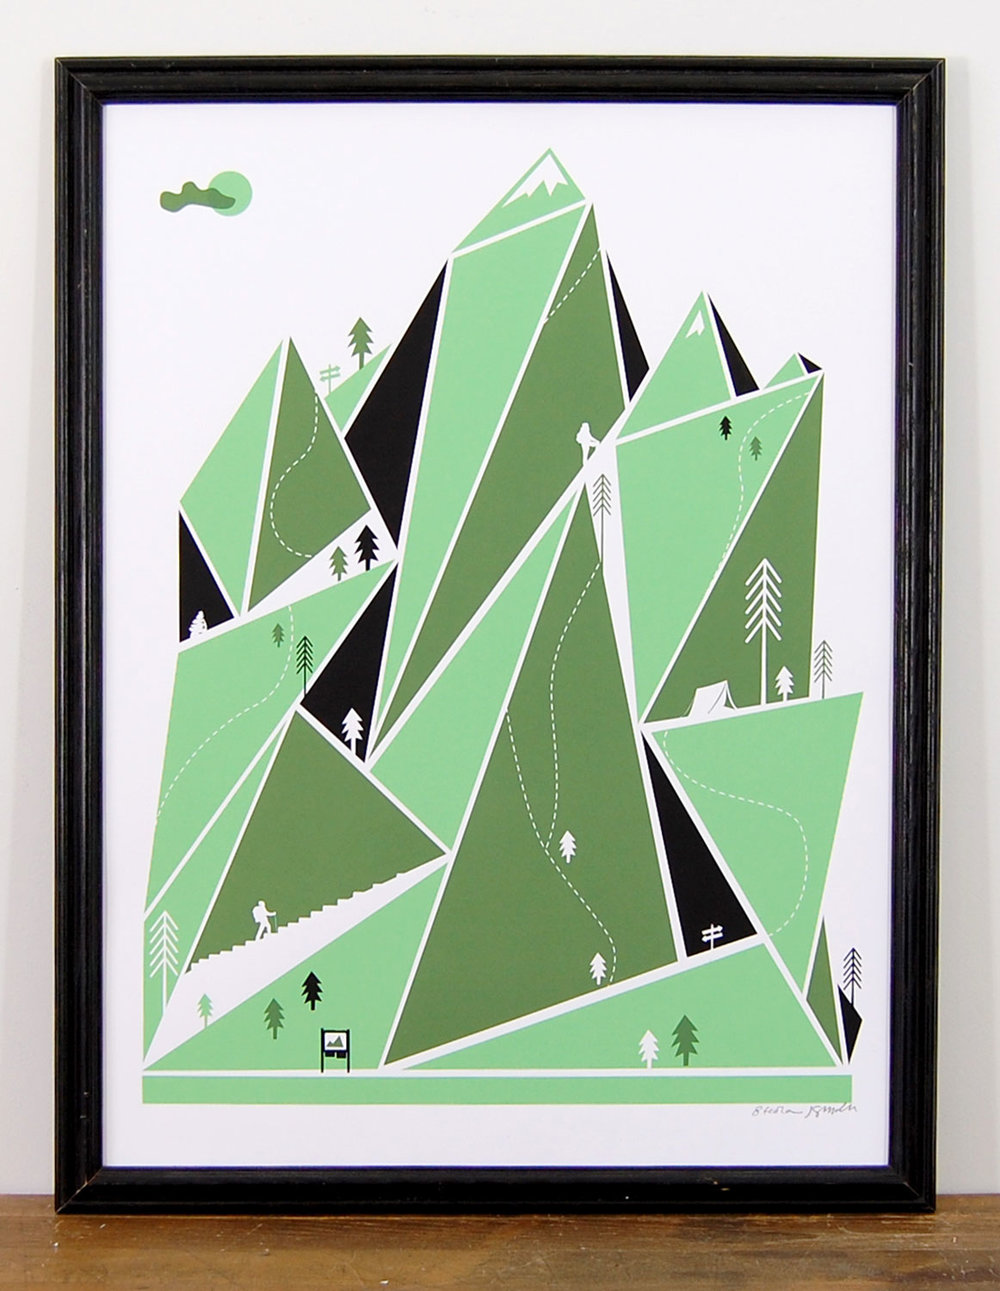 Artwork by Brainstorm Print + Design